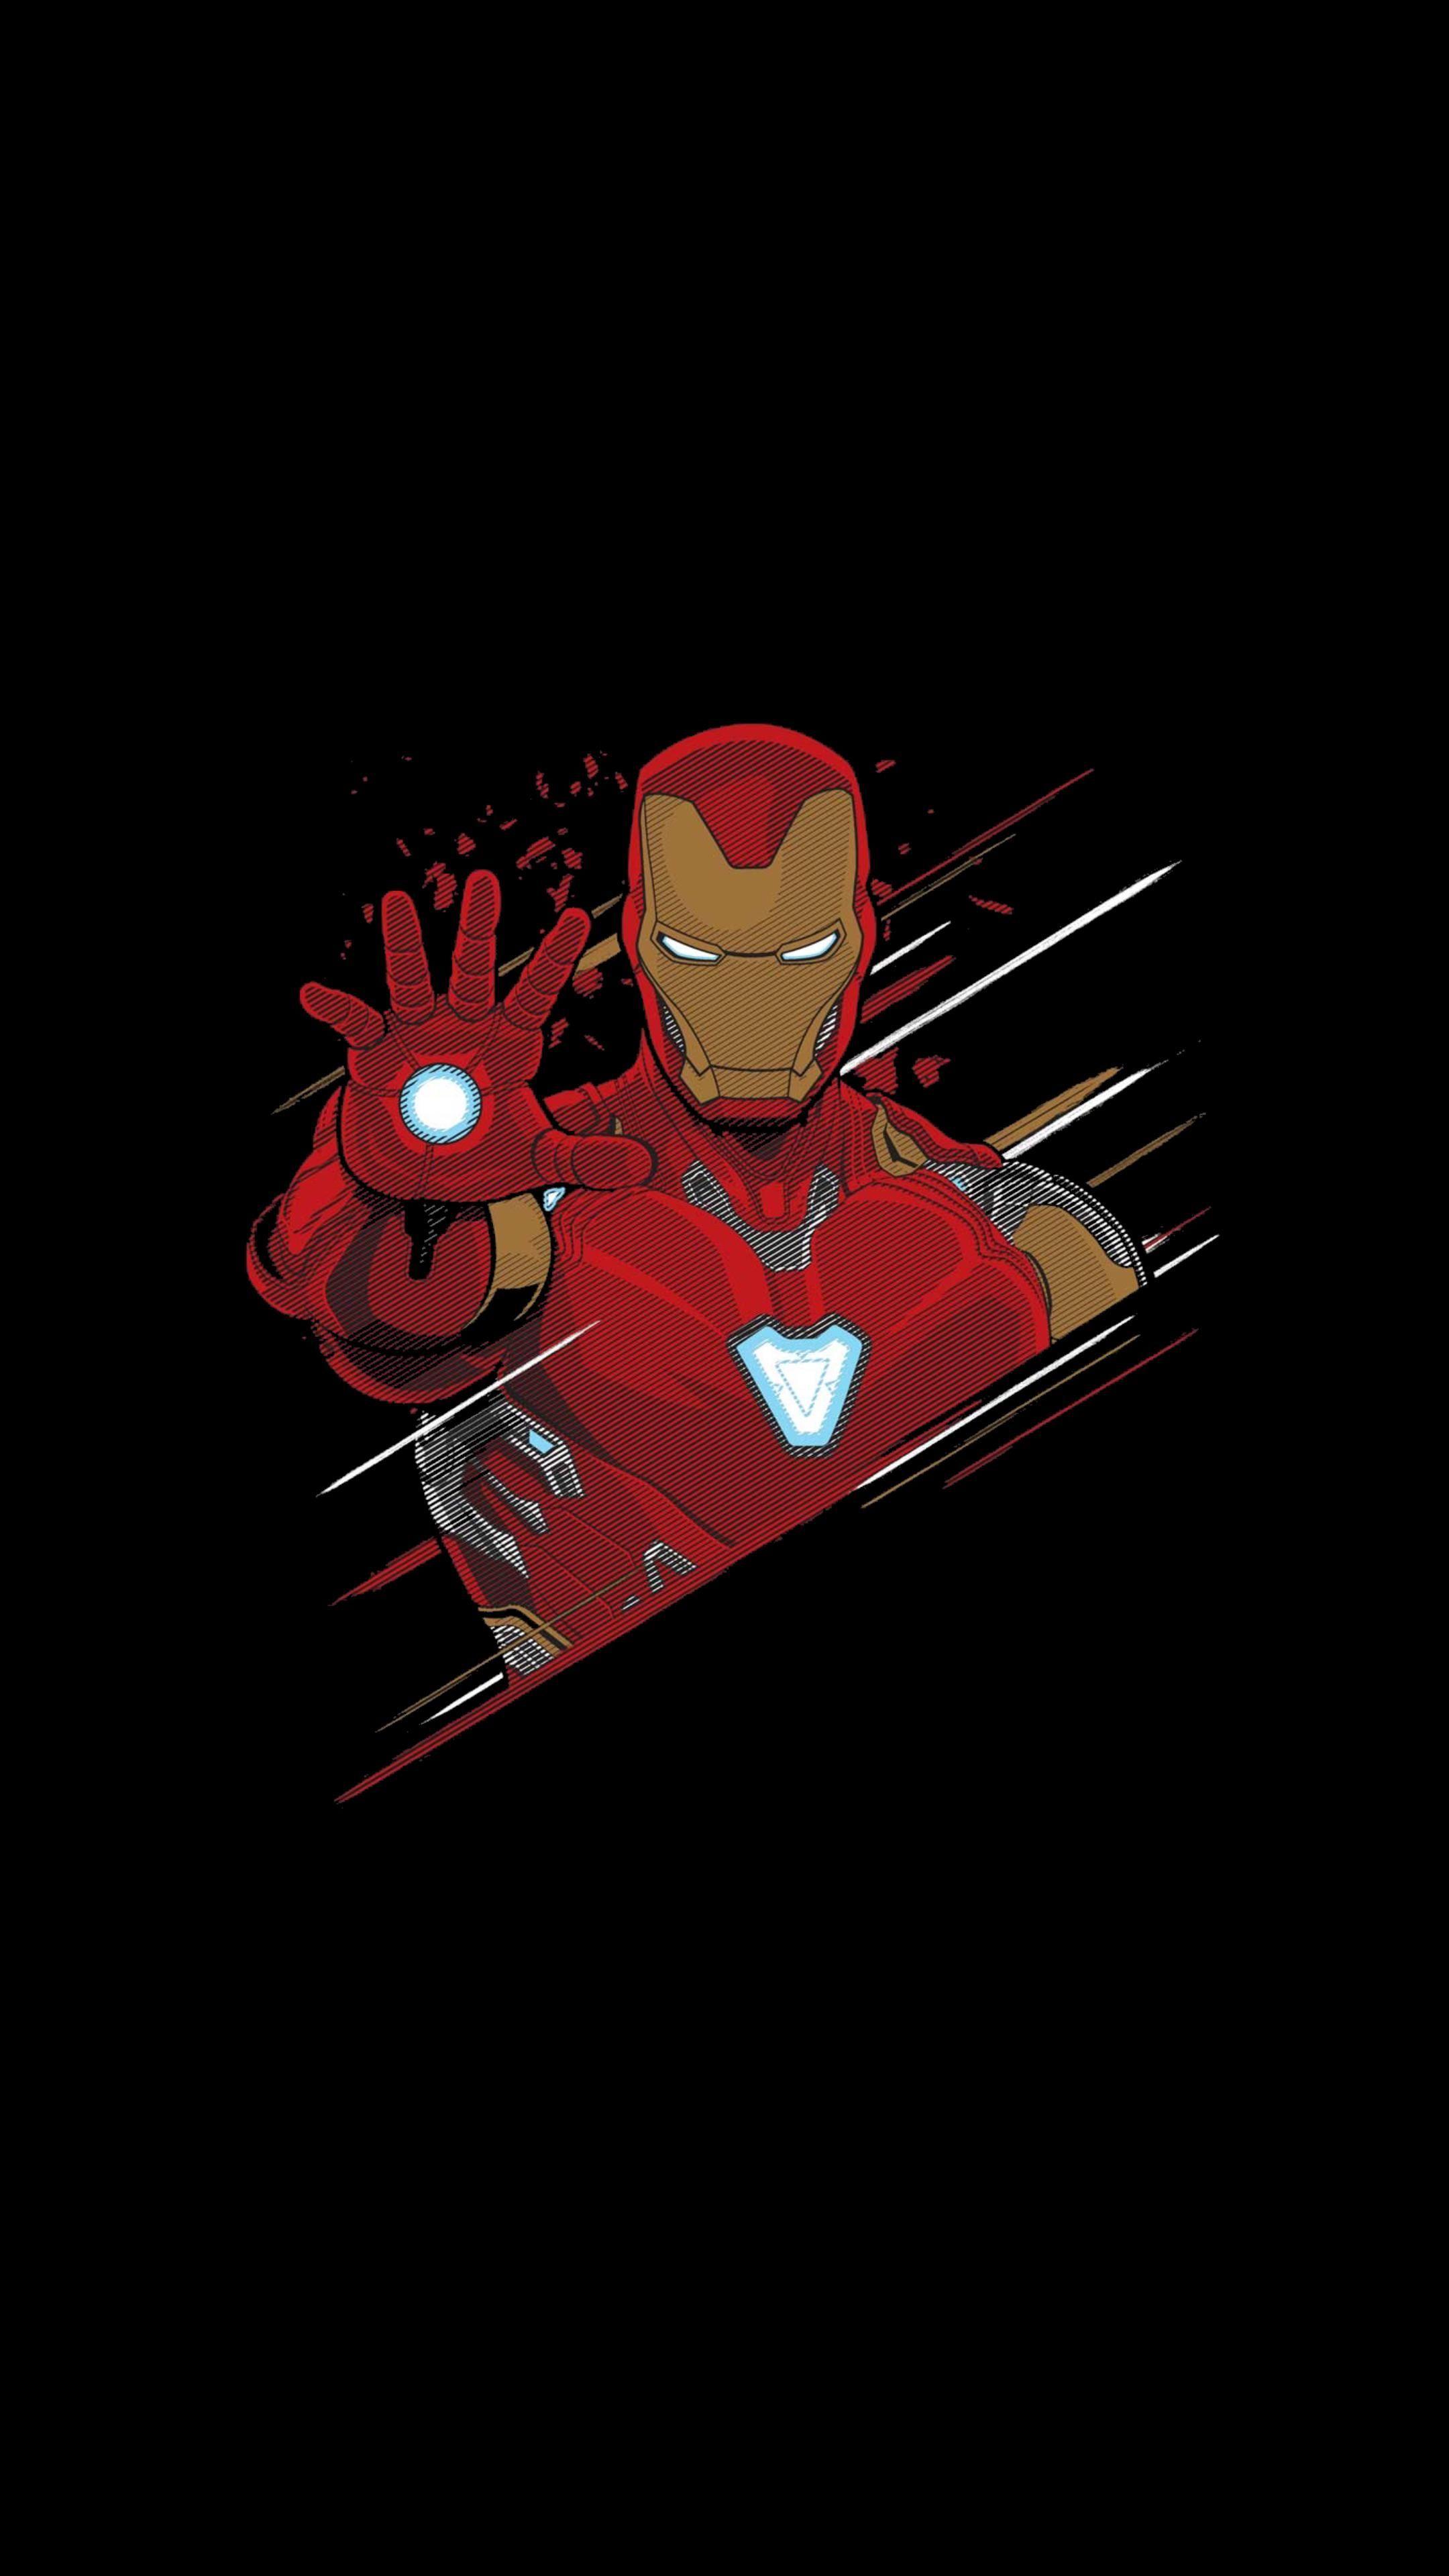 4k Iron Man Wallpaper 2160x3840 Iron Man Wallpaper Iron Man Hd Wallpaper Avengers Wallpaper